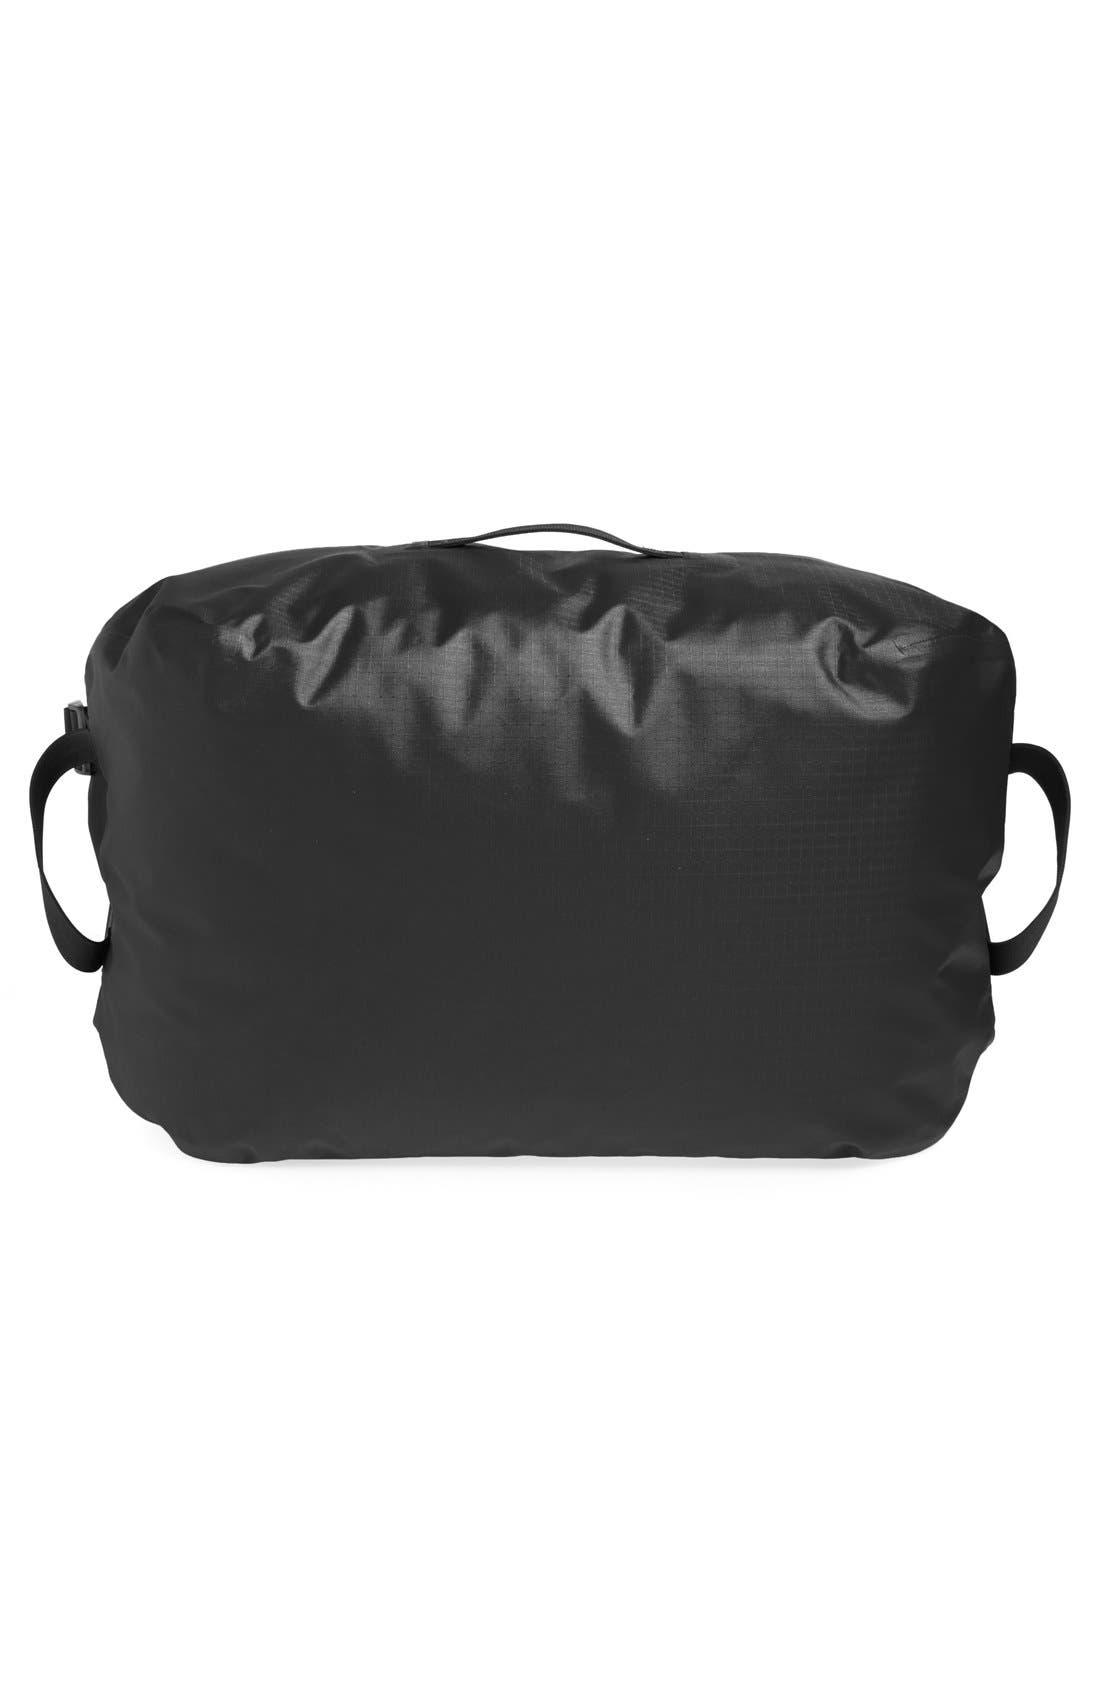 Alternate Image 3  - Arc'teryx 'Carrier' Weather Resistant Convertible Duffel Bag/Backpack (50 liter)